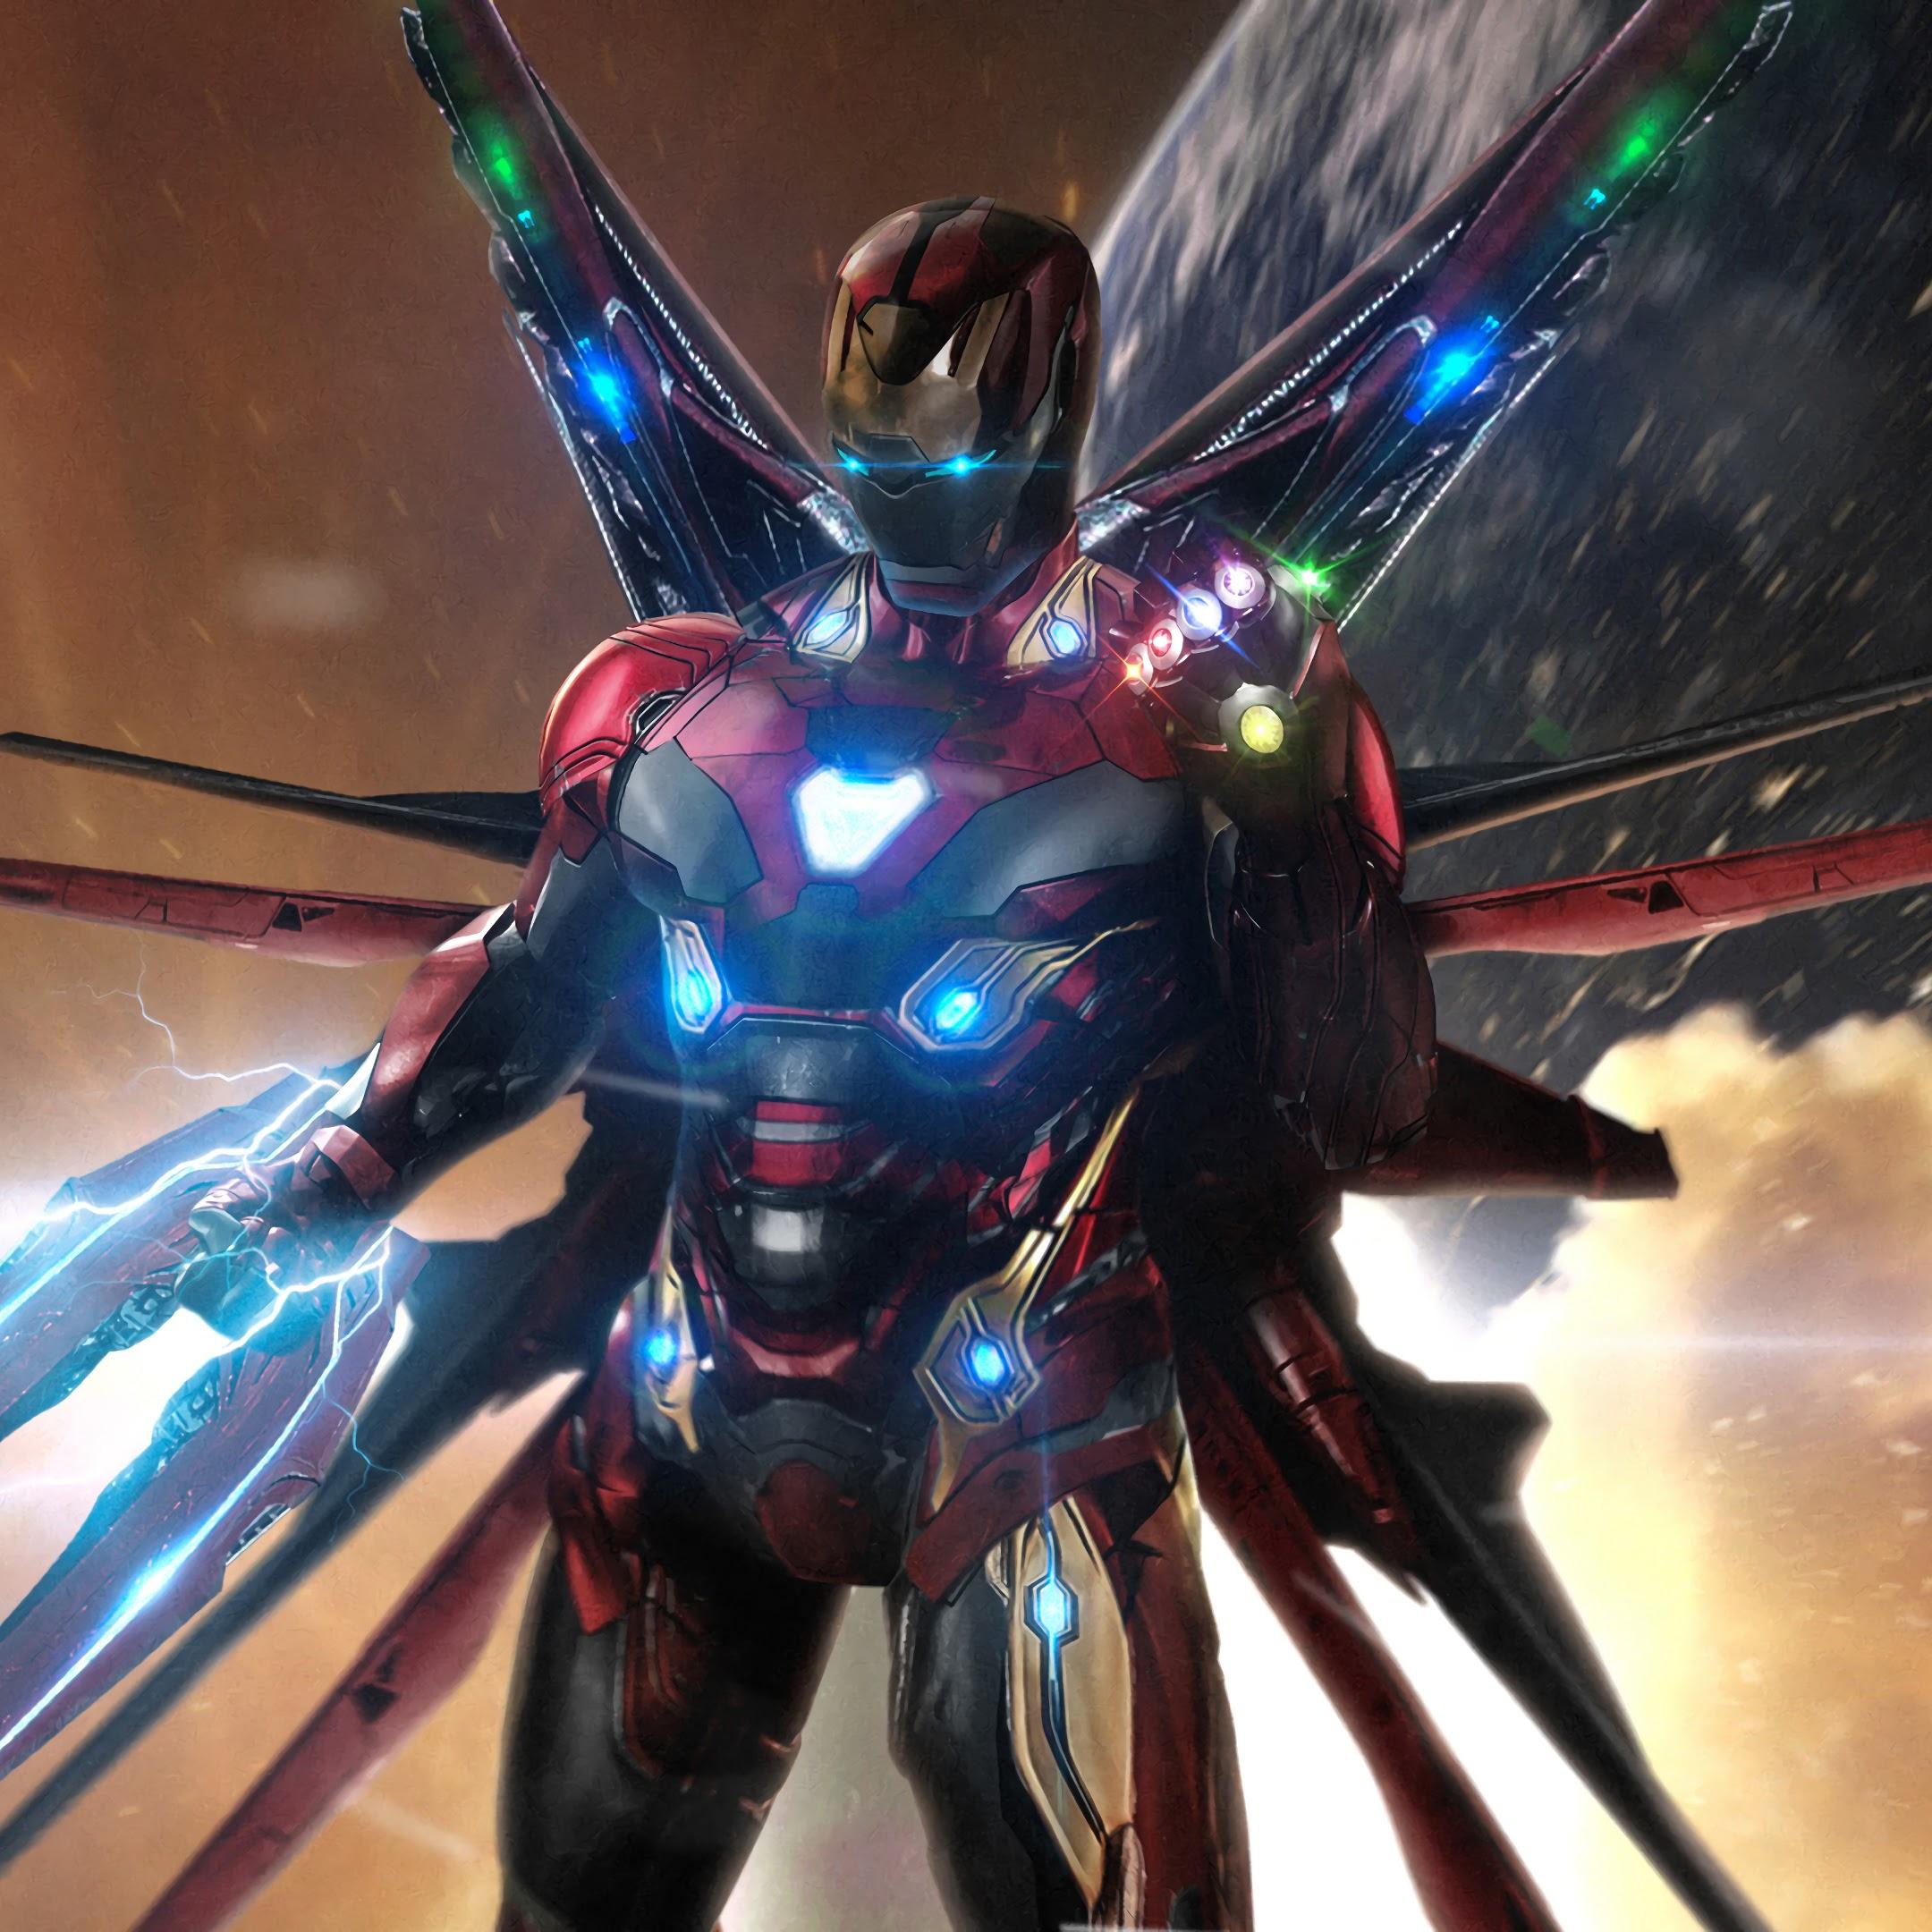 Iron Man Infinity Stones Avengers Endgame 4k 12